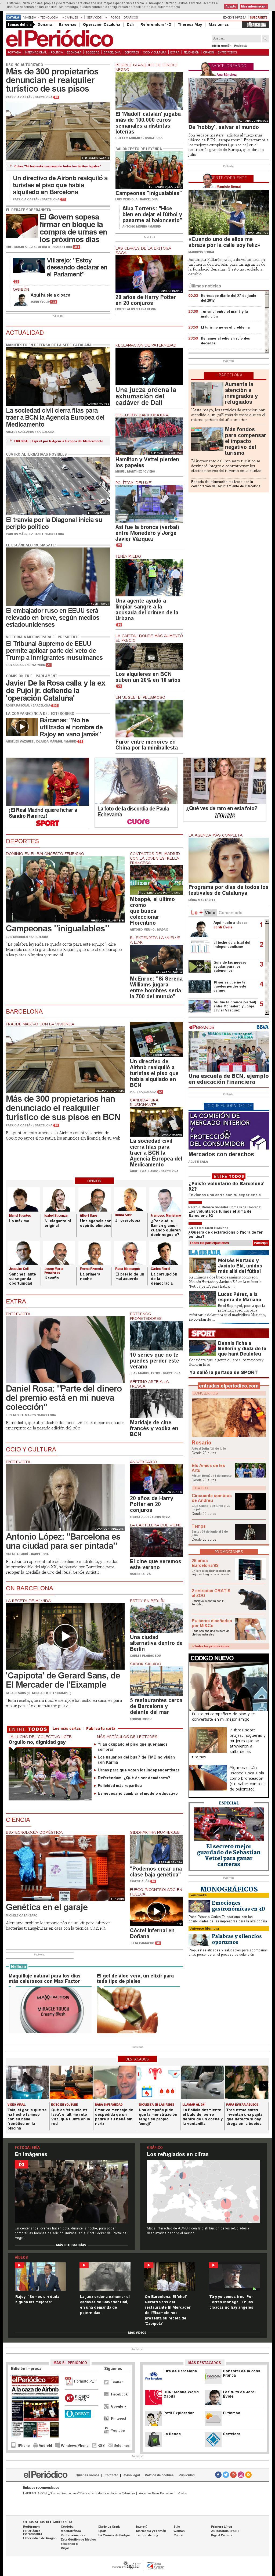 El Periodico at Tuesday June 27, 2017, 12:17 a.m. UTC